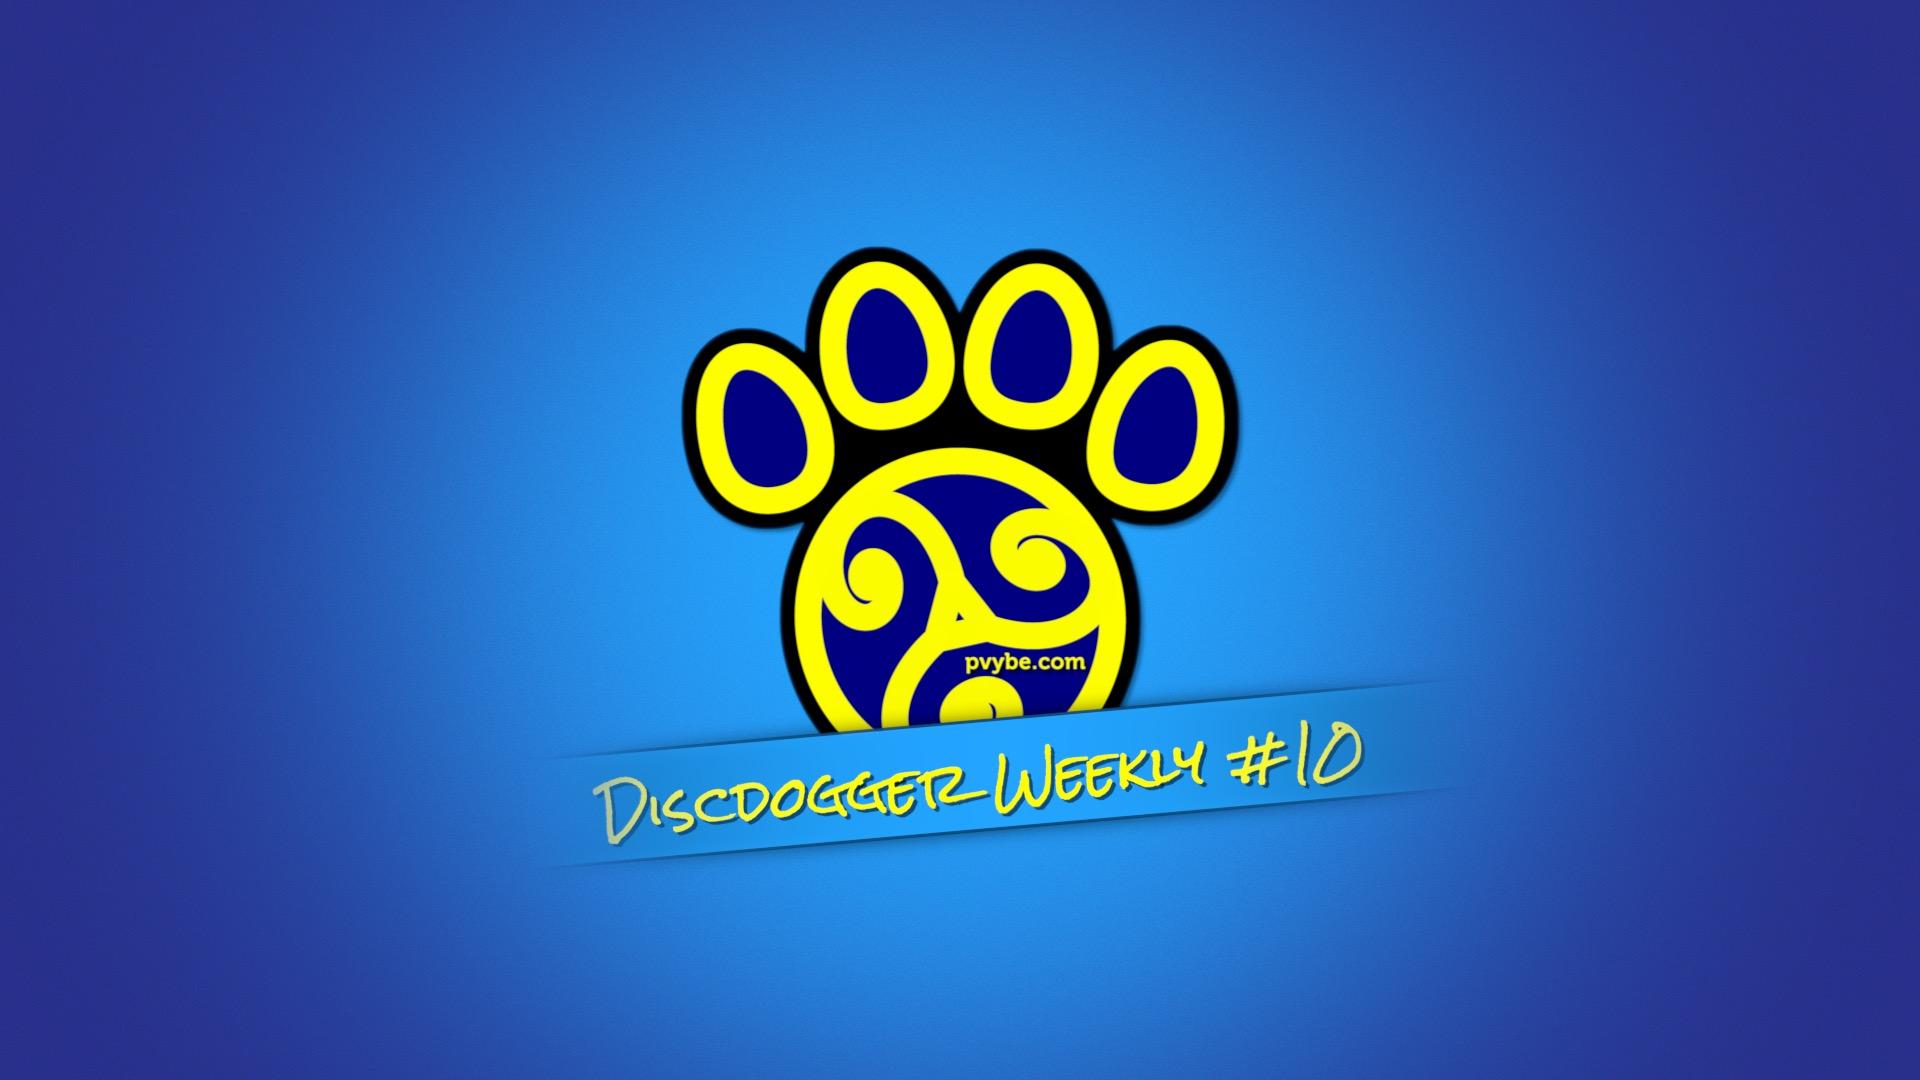 discdogger weekly #10